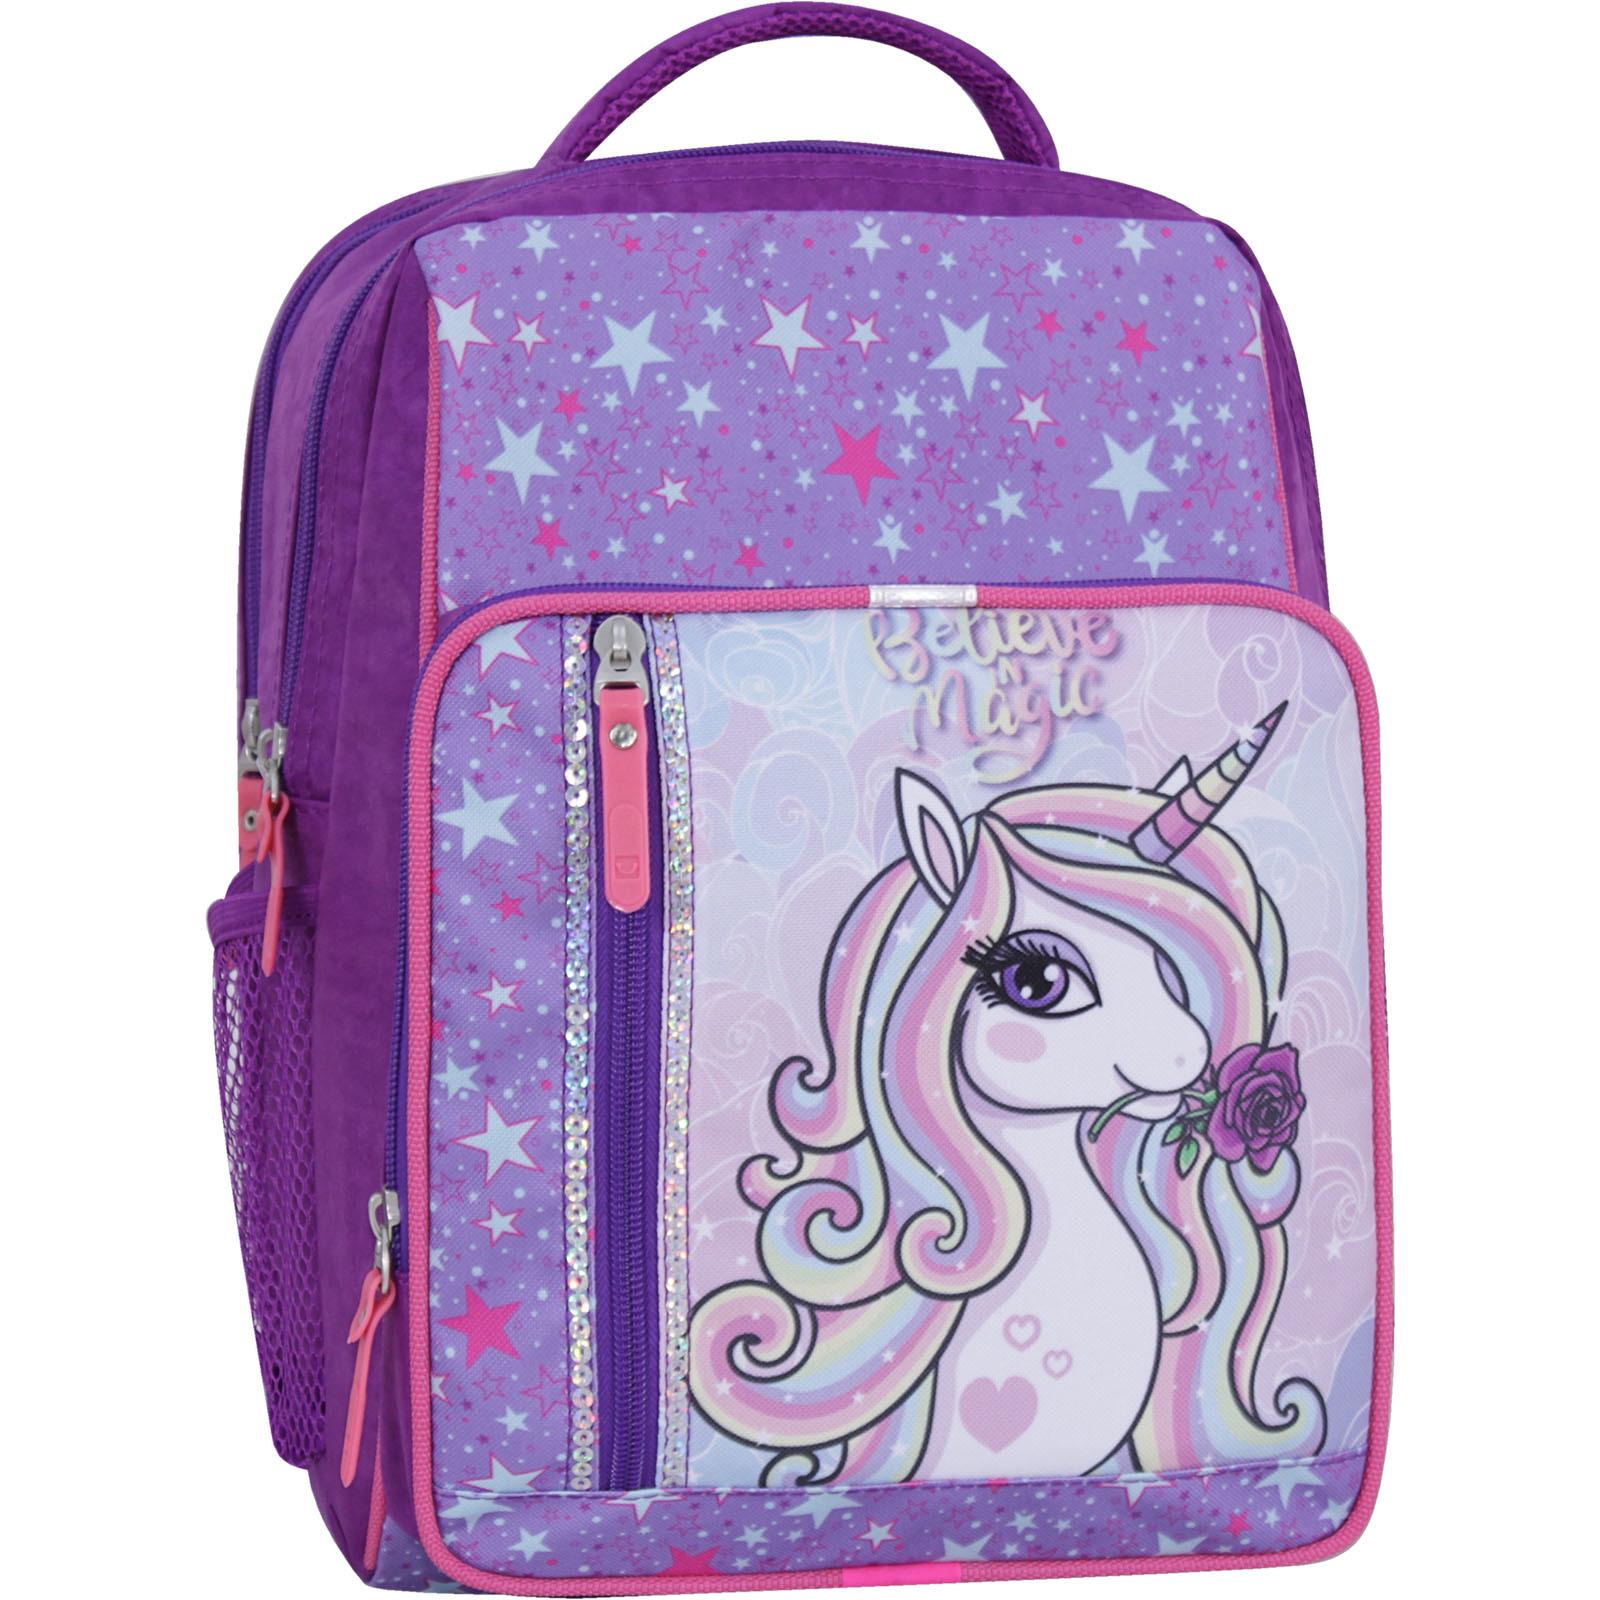 Школьные рюкзаки Рюкзак школьный Bagland Школьник 8 л. фиолетовый 678 (0012870) IMG_2630_суб_678_-1600.jpg